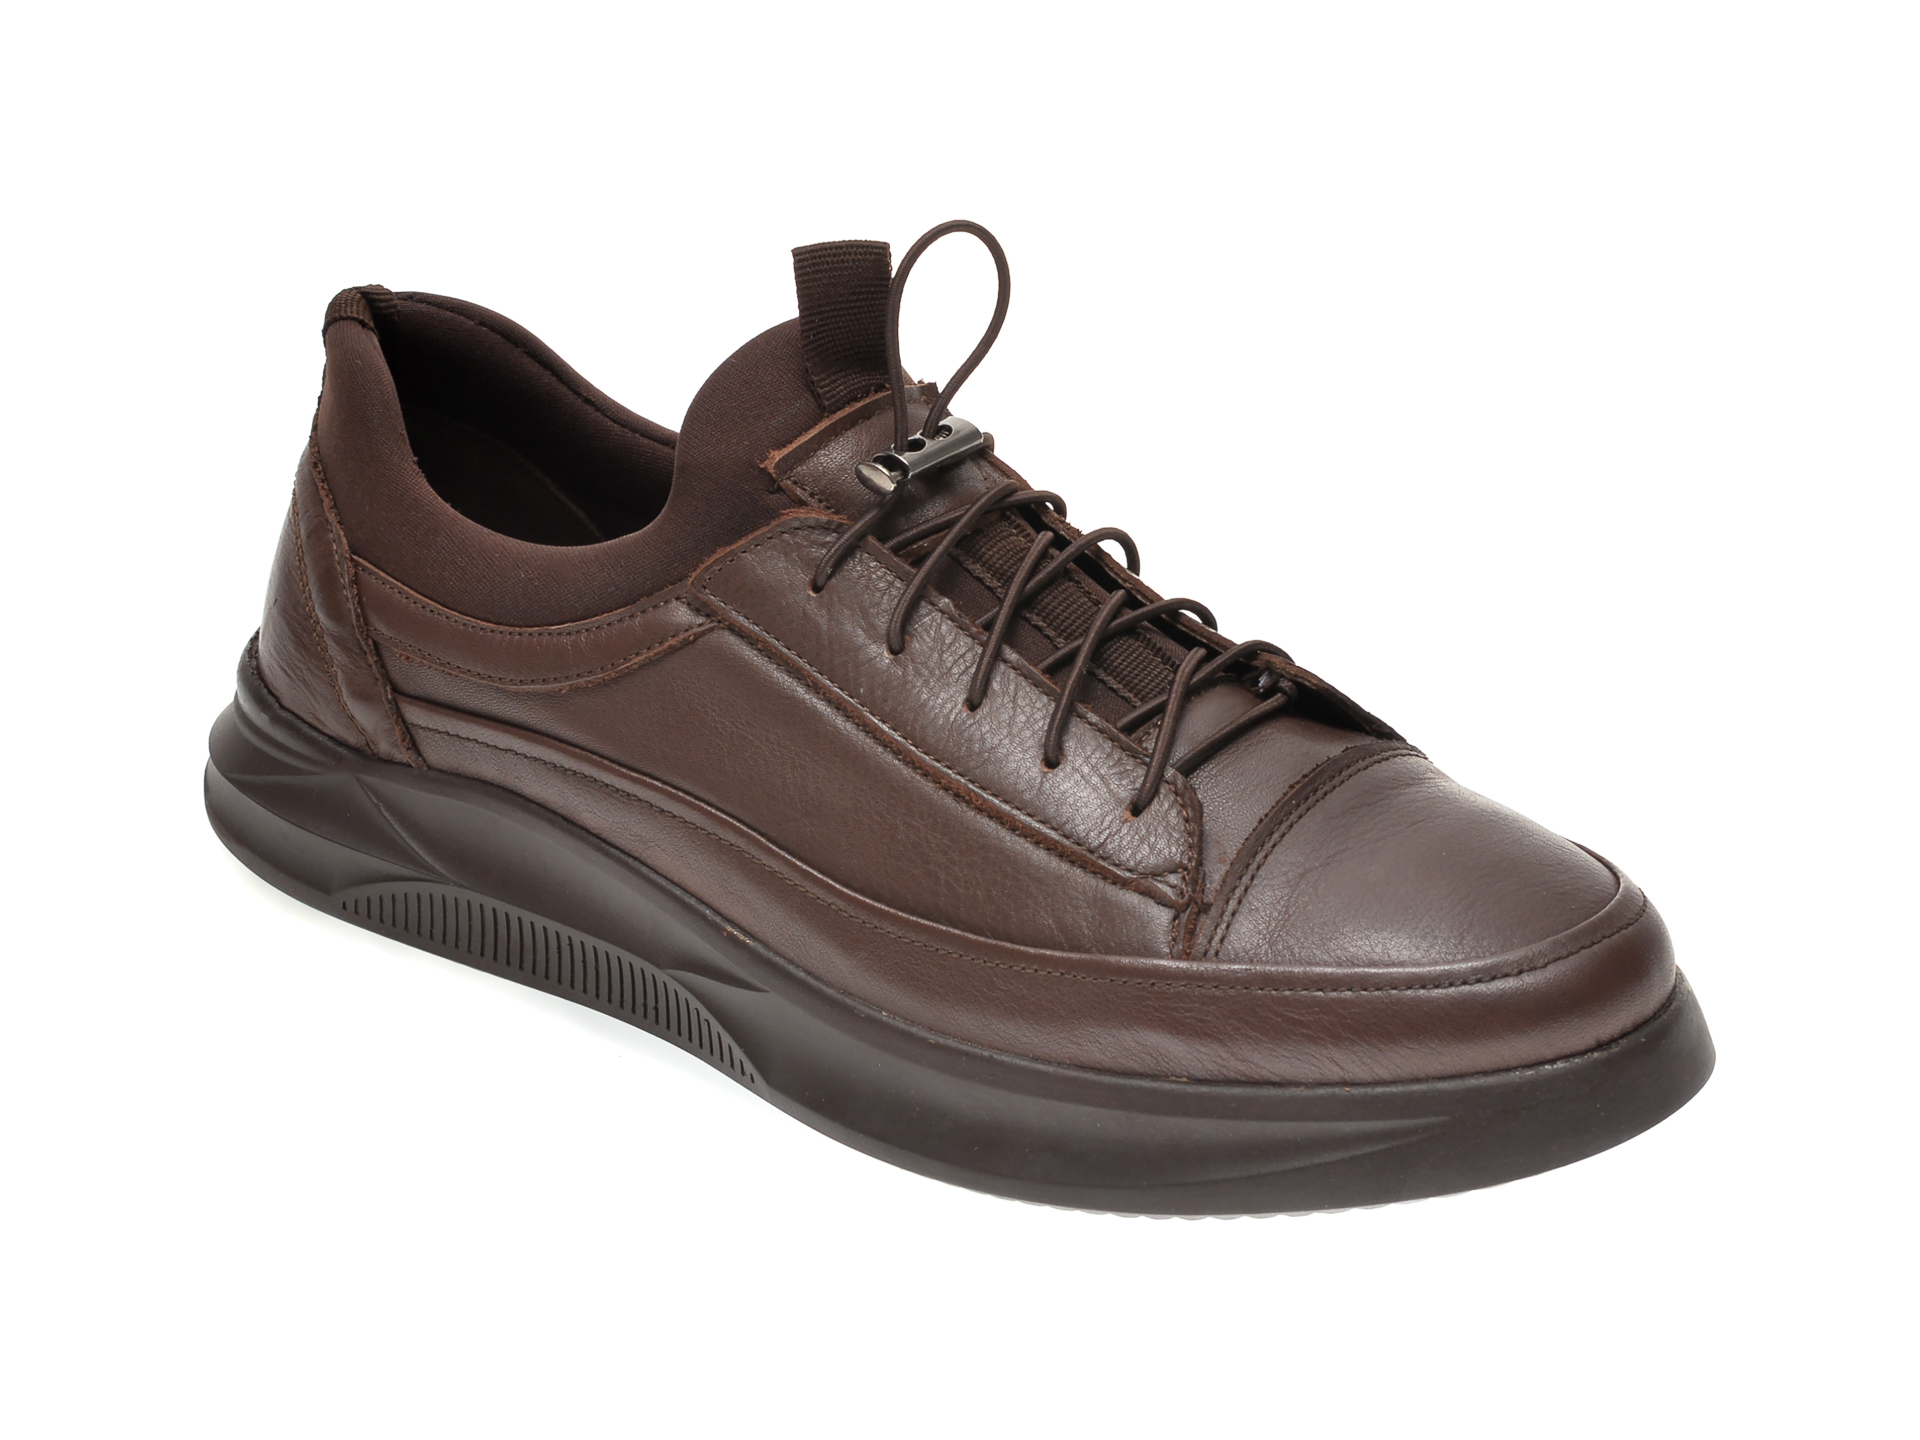 Pantofi OTTER maro, M5794, din piele naturala imagine